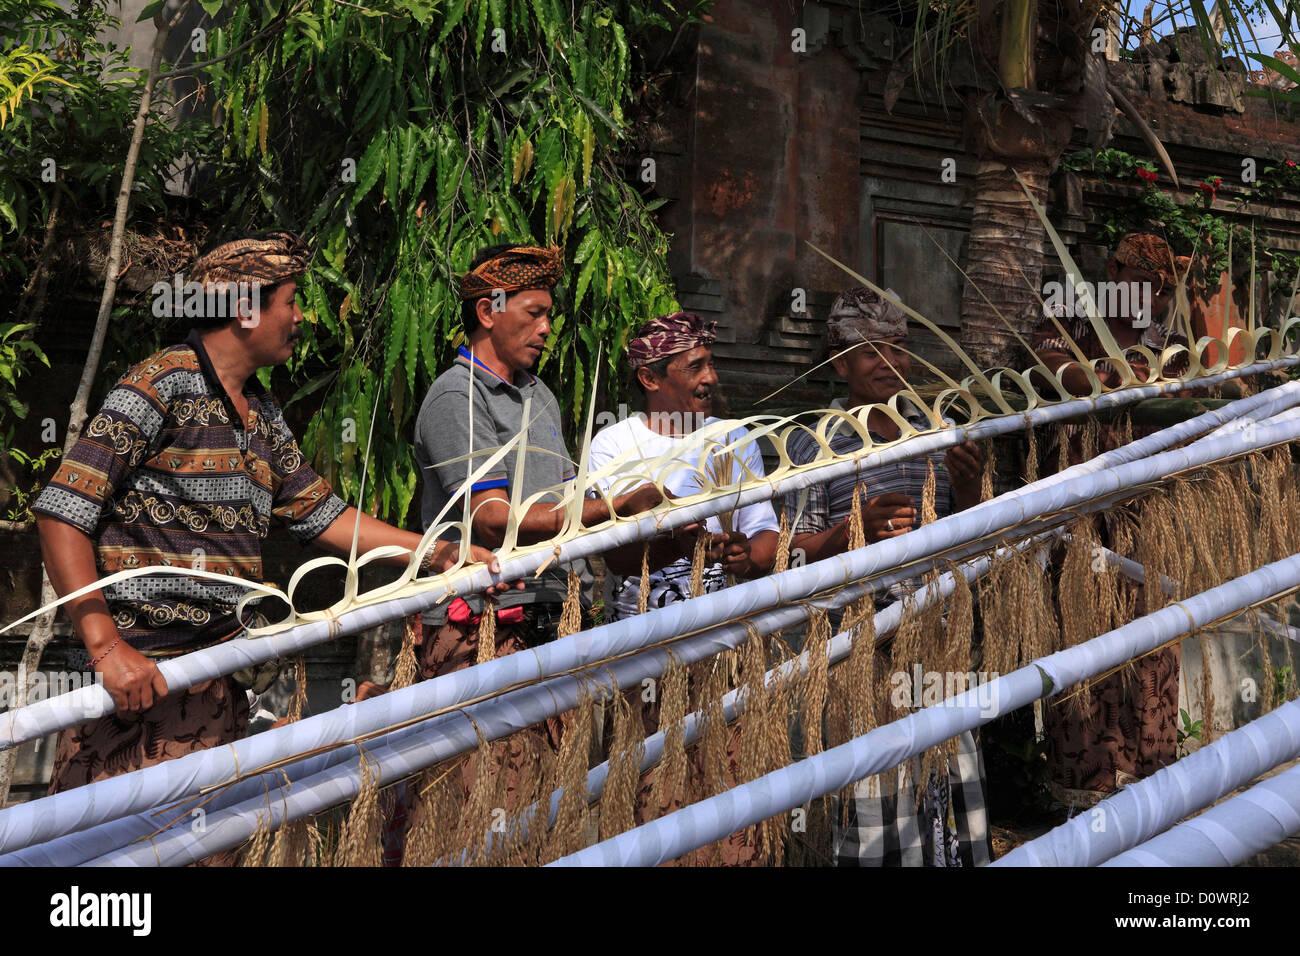 A group of men making Penjors. Pejeng Village, near Ubud, Bali, Indonesia - Stock Image